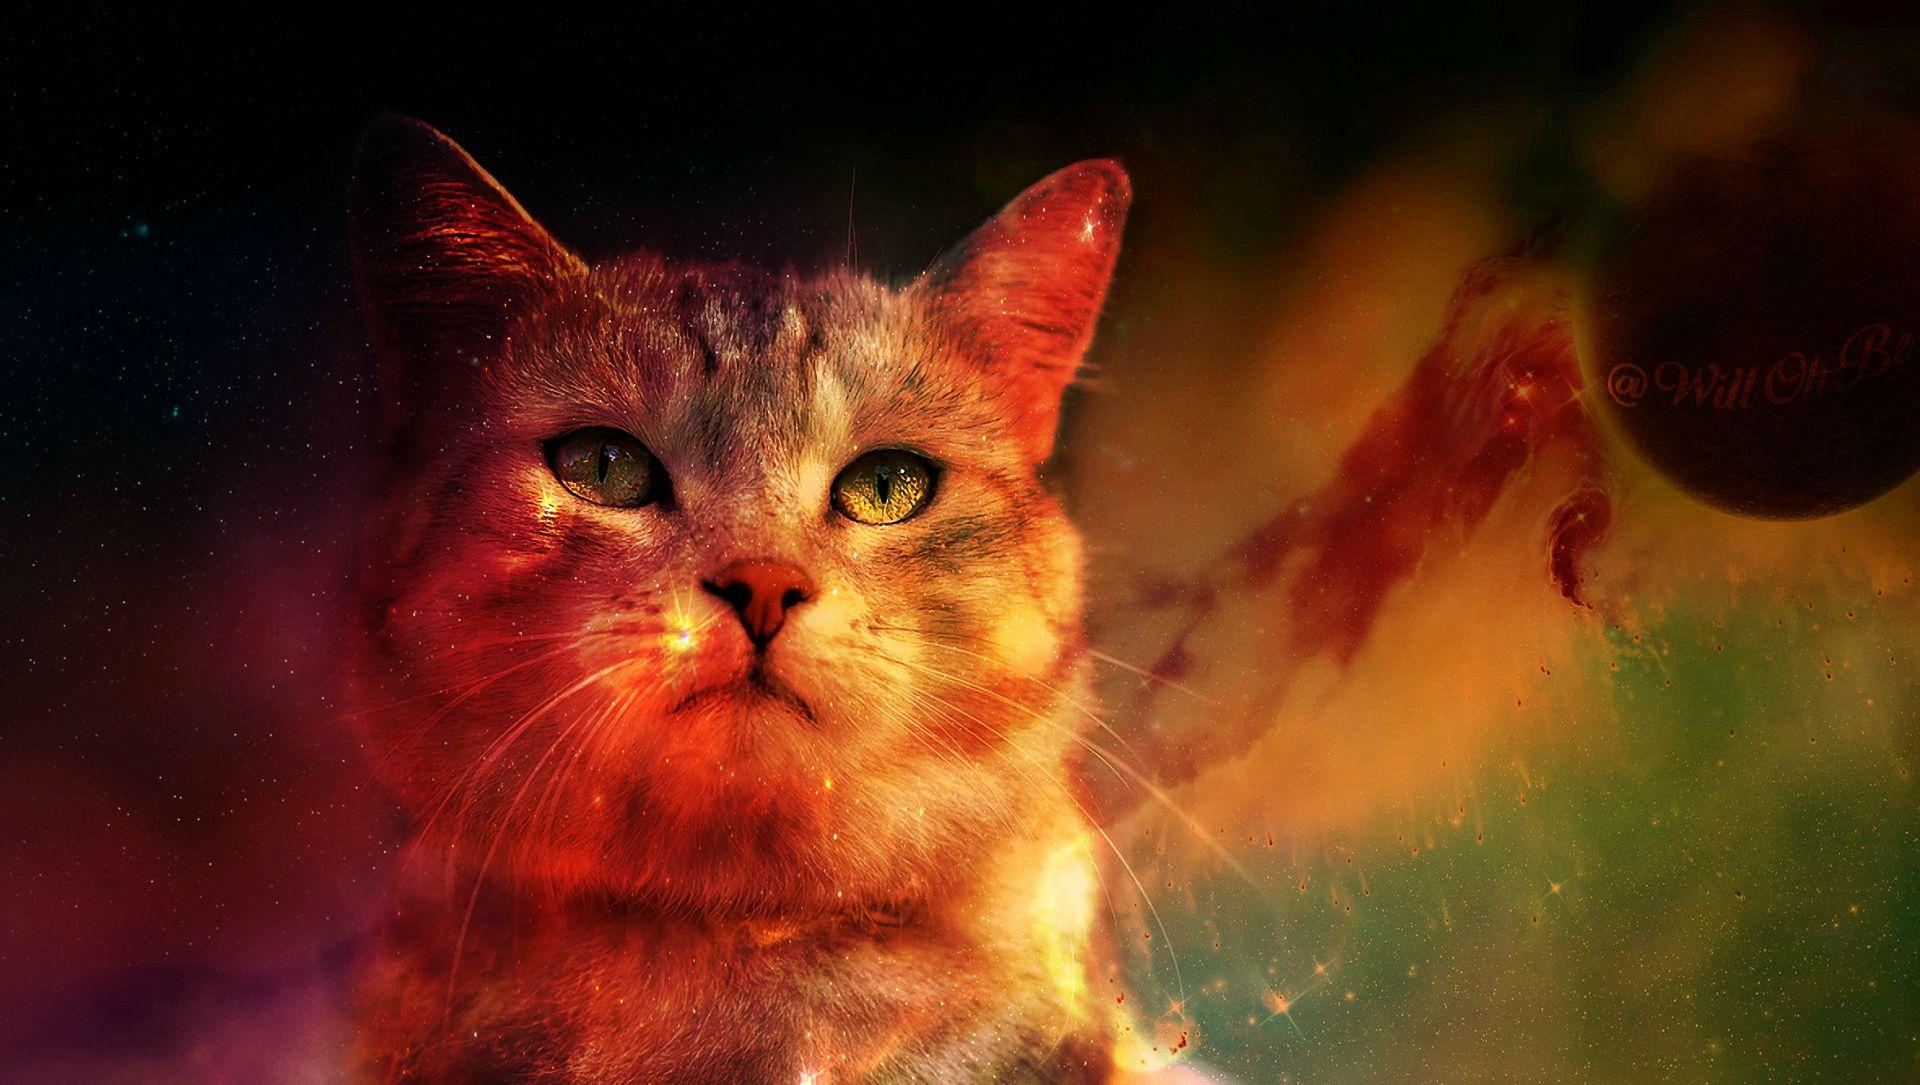 Cat In Space Digital Art Planet Wallpaper, HD Animals 4K ...